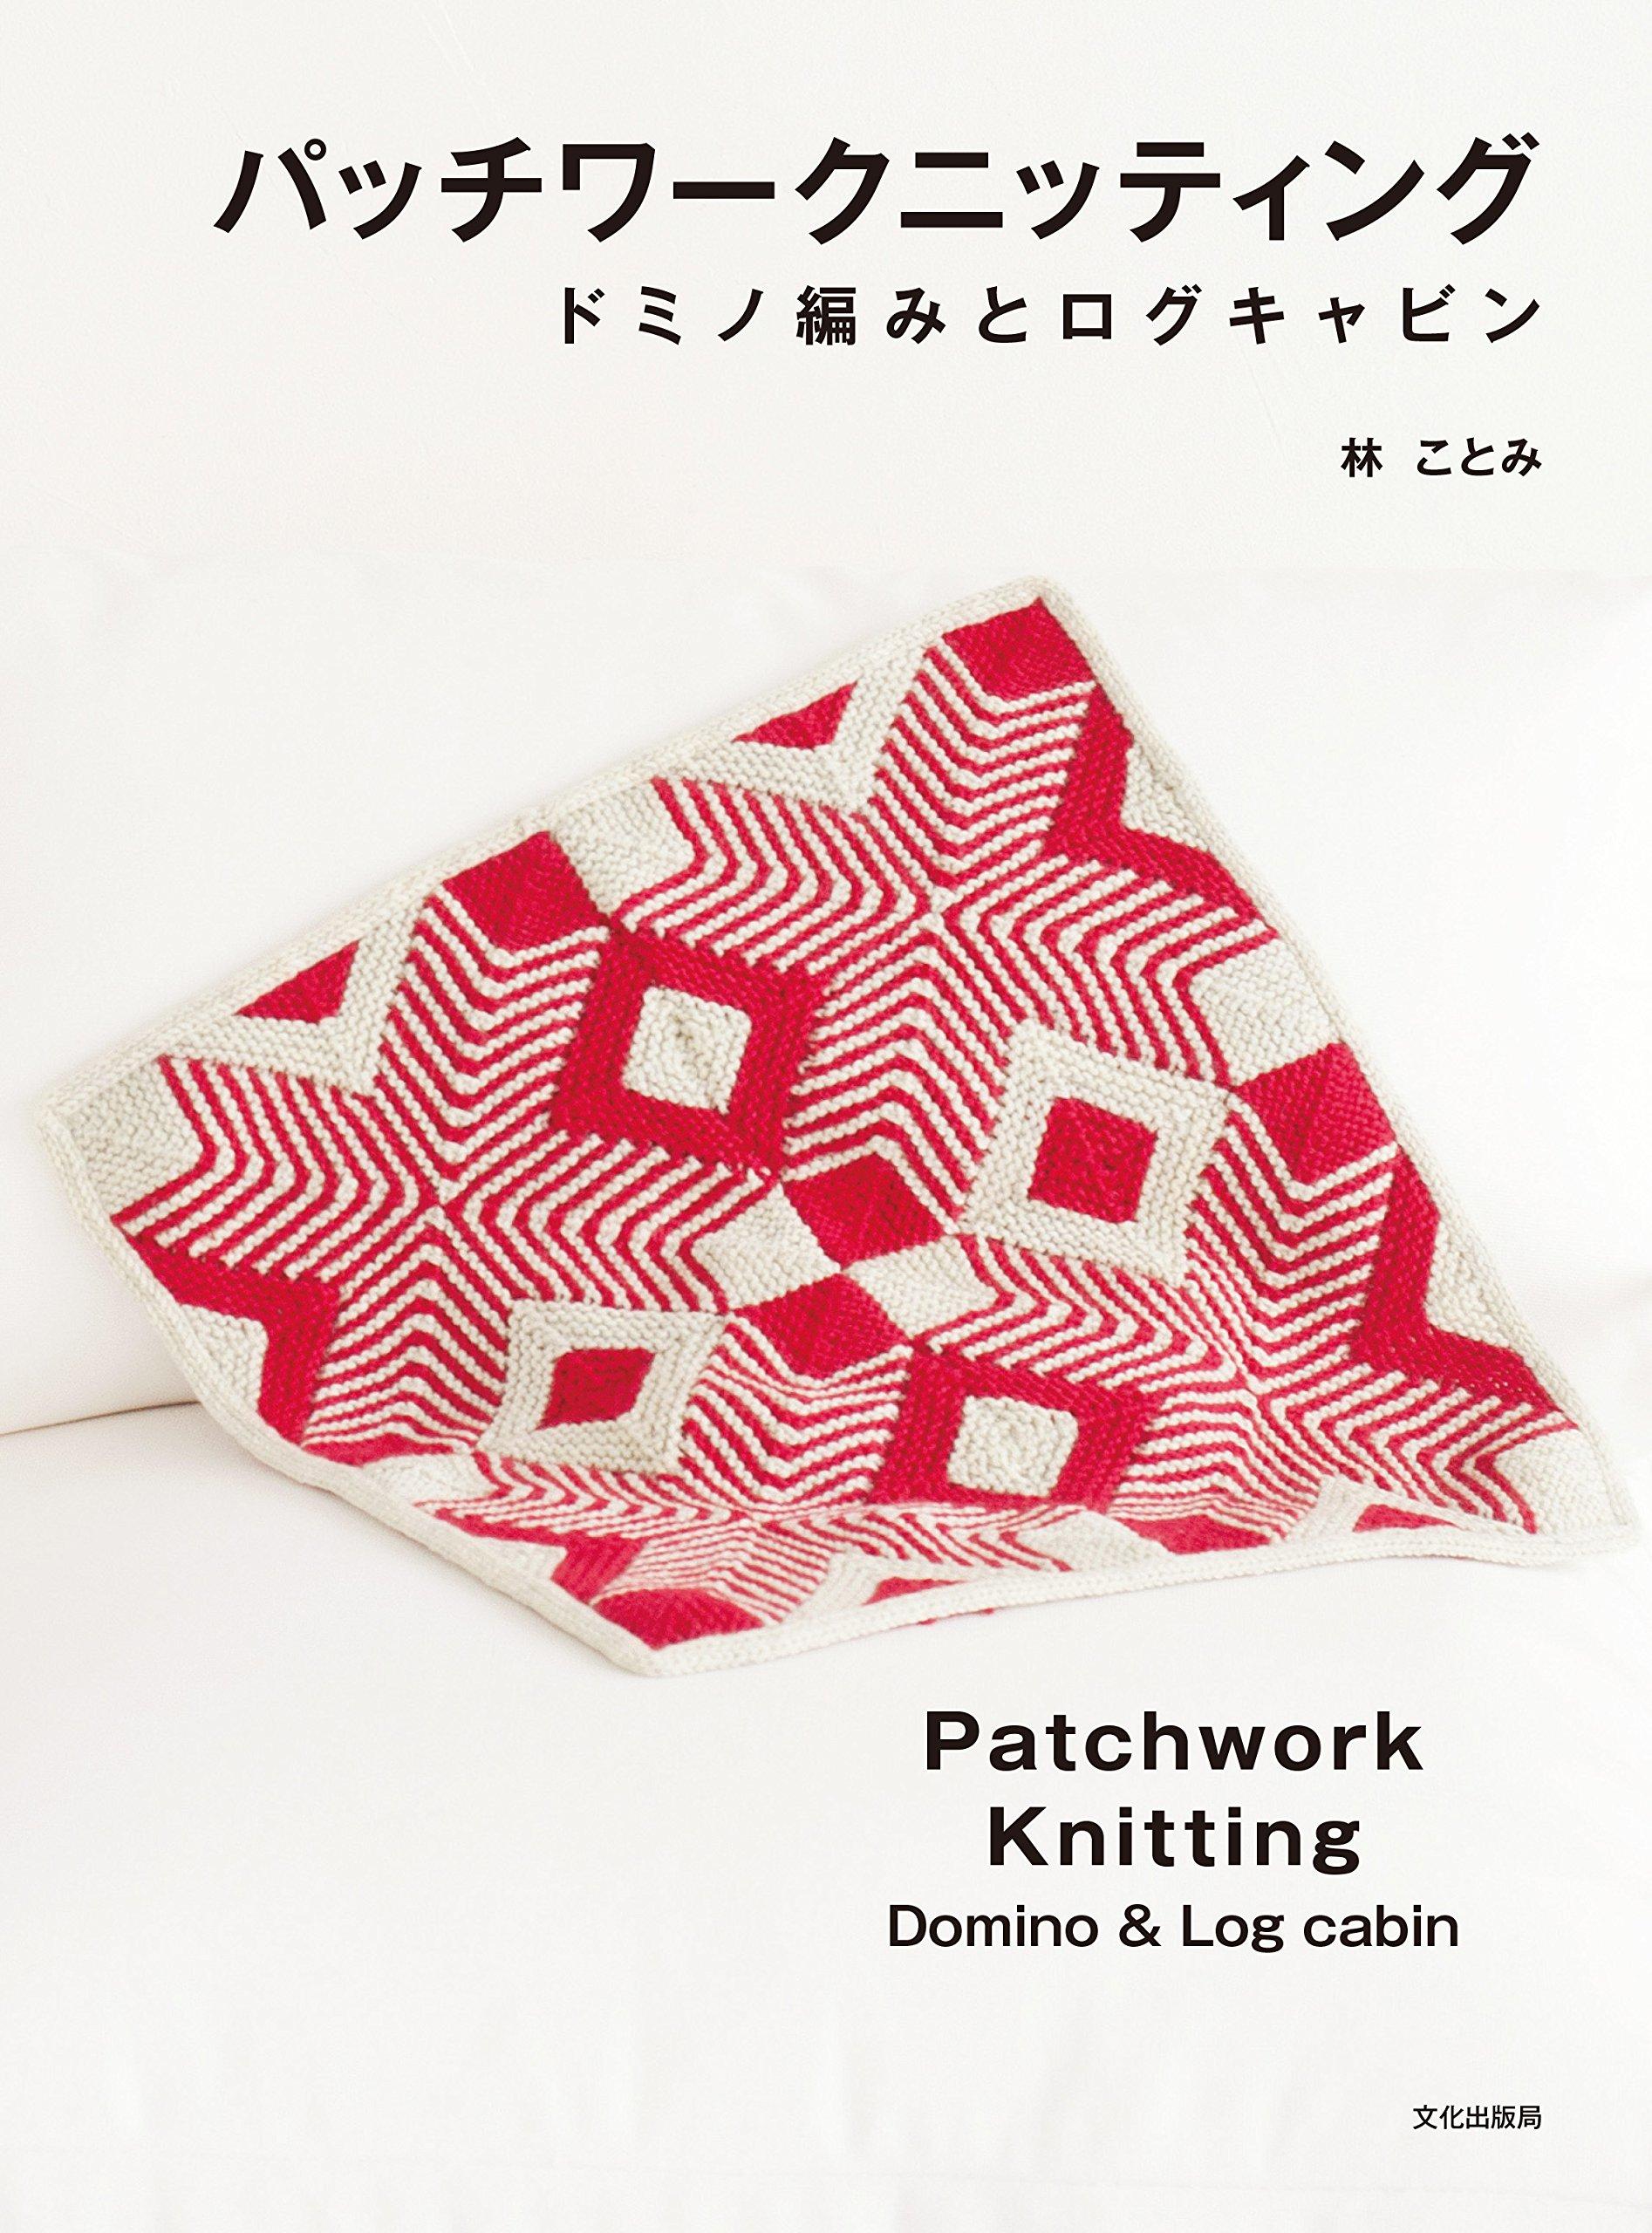 Domino knitting and log cabin